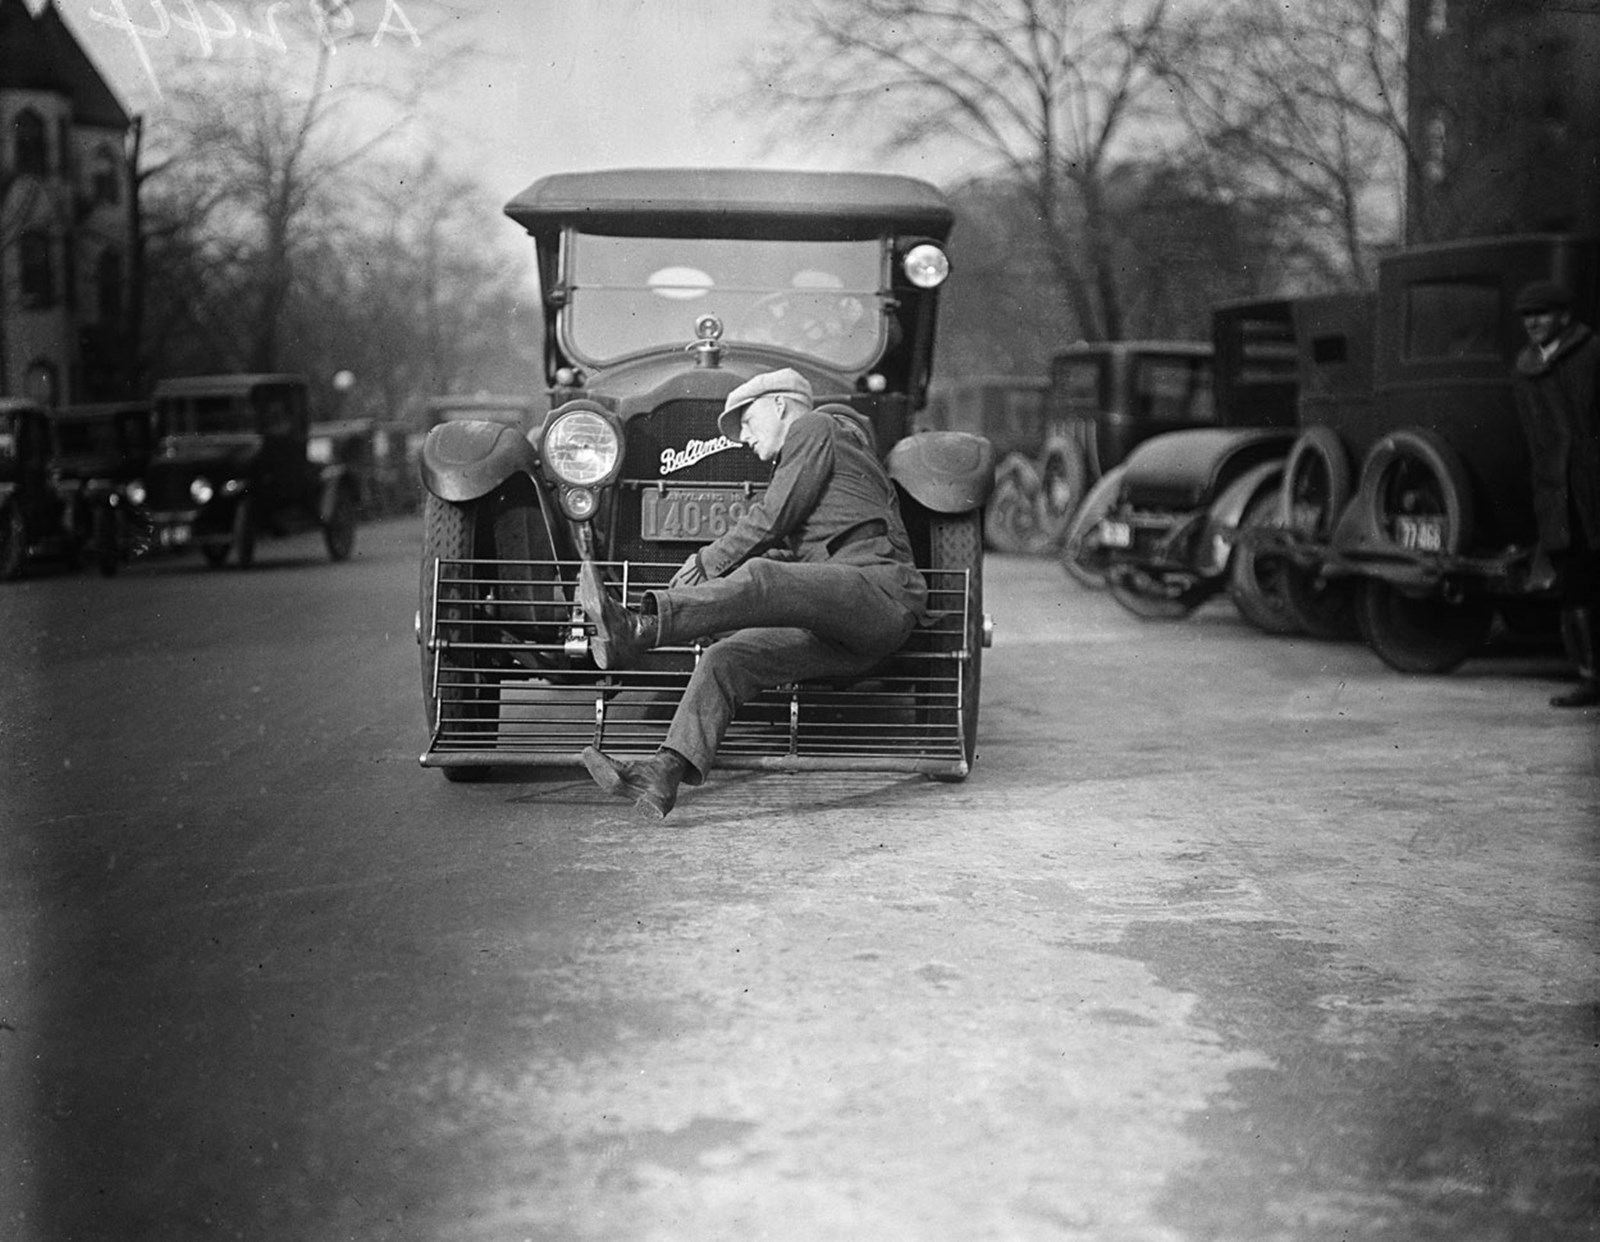 1920s-pedestrian-catcher-3.jpg